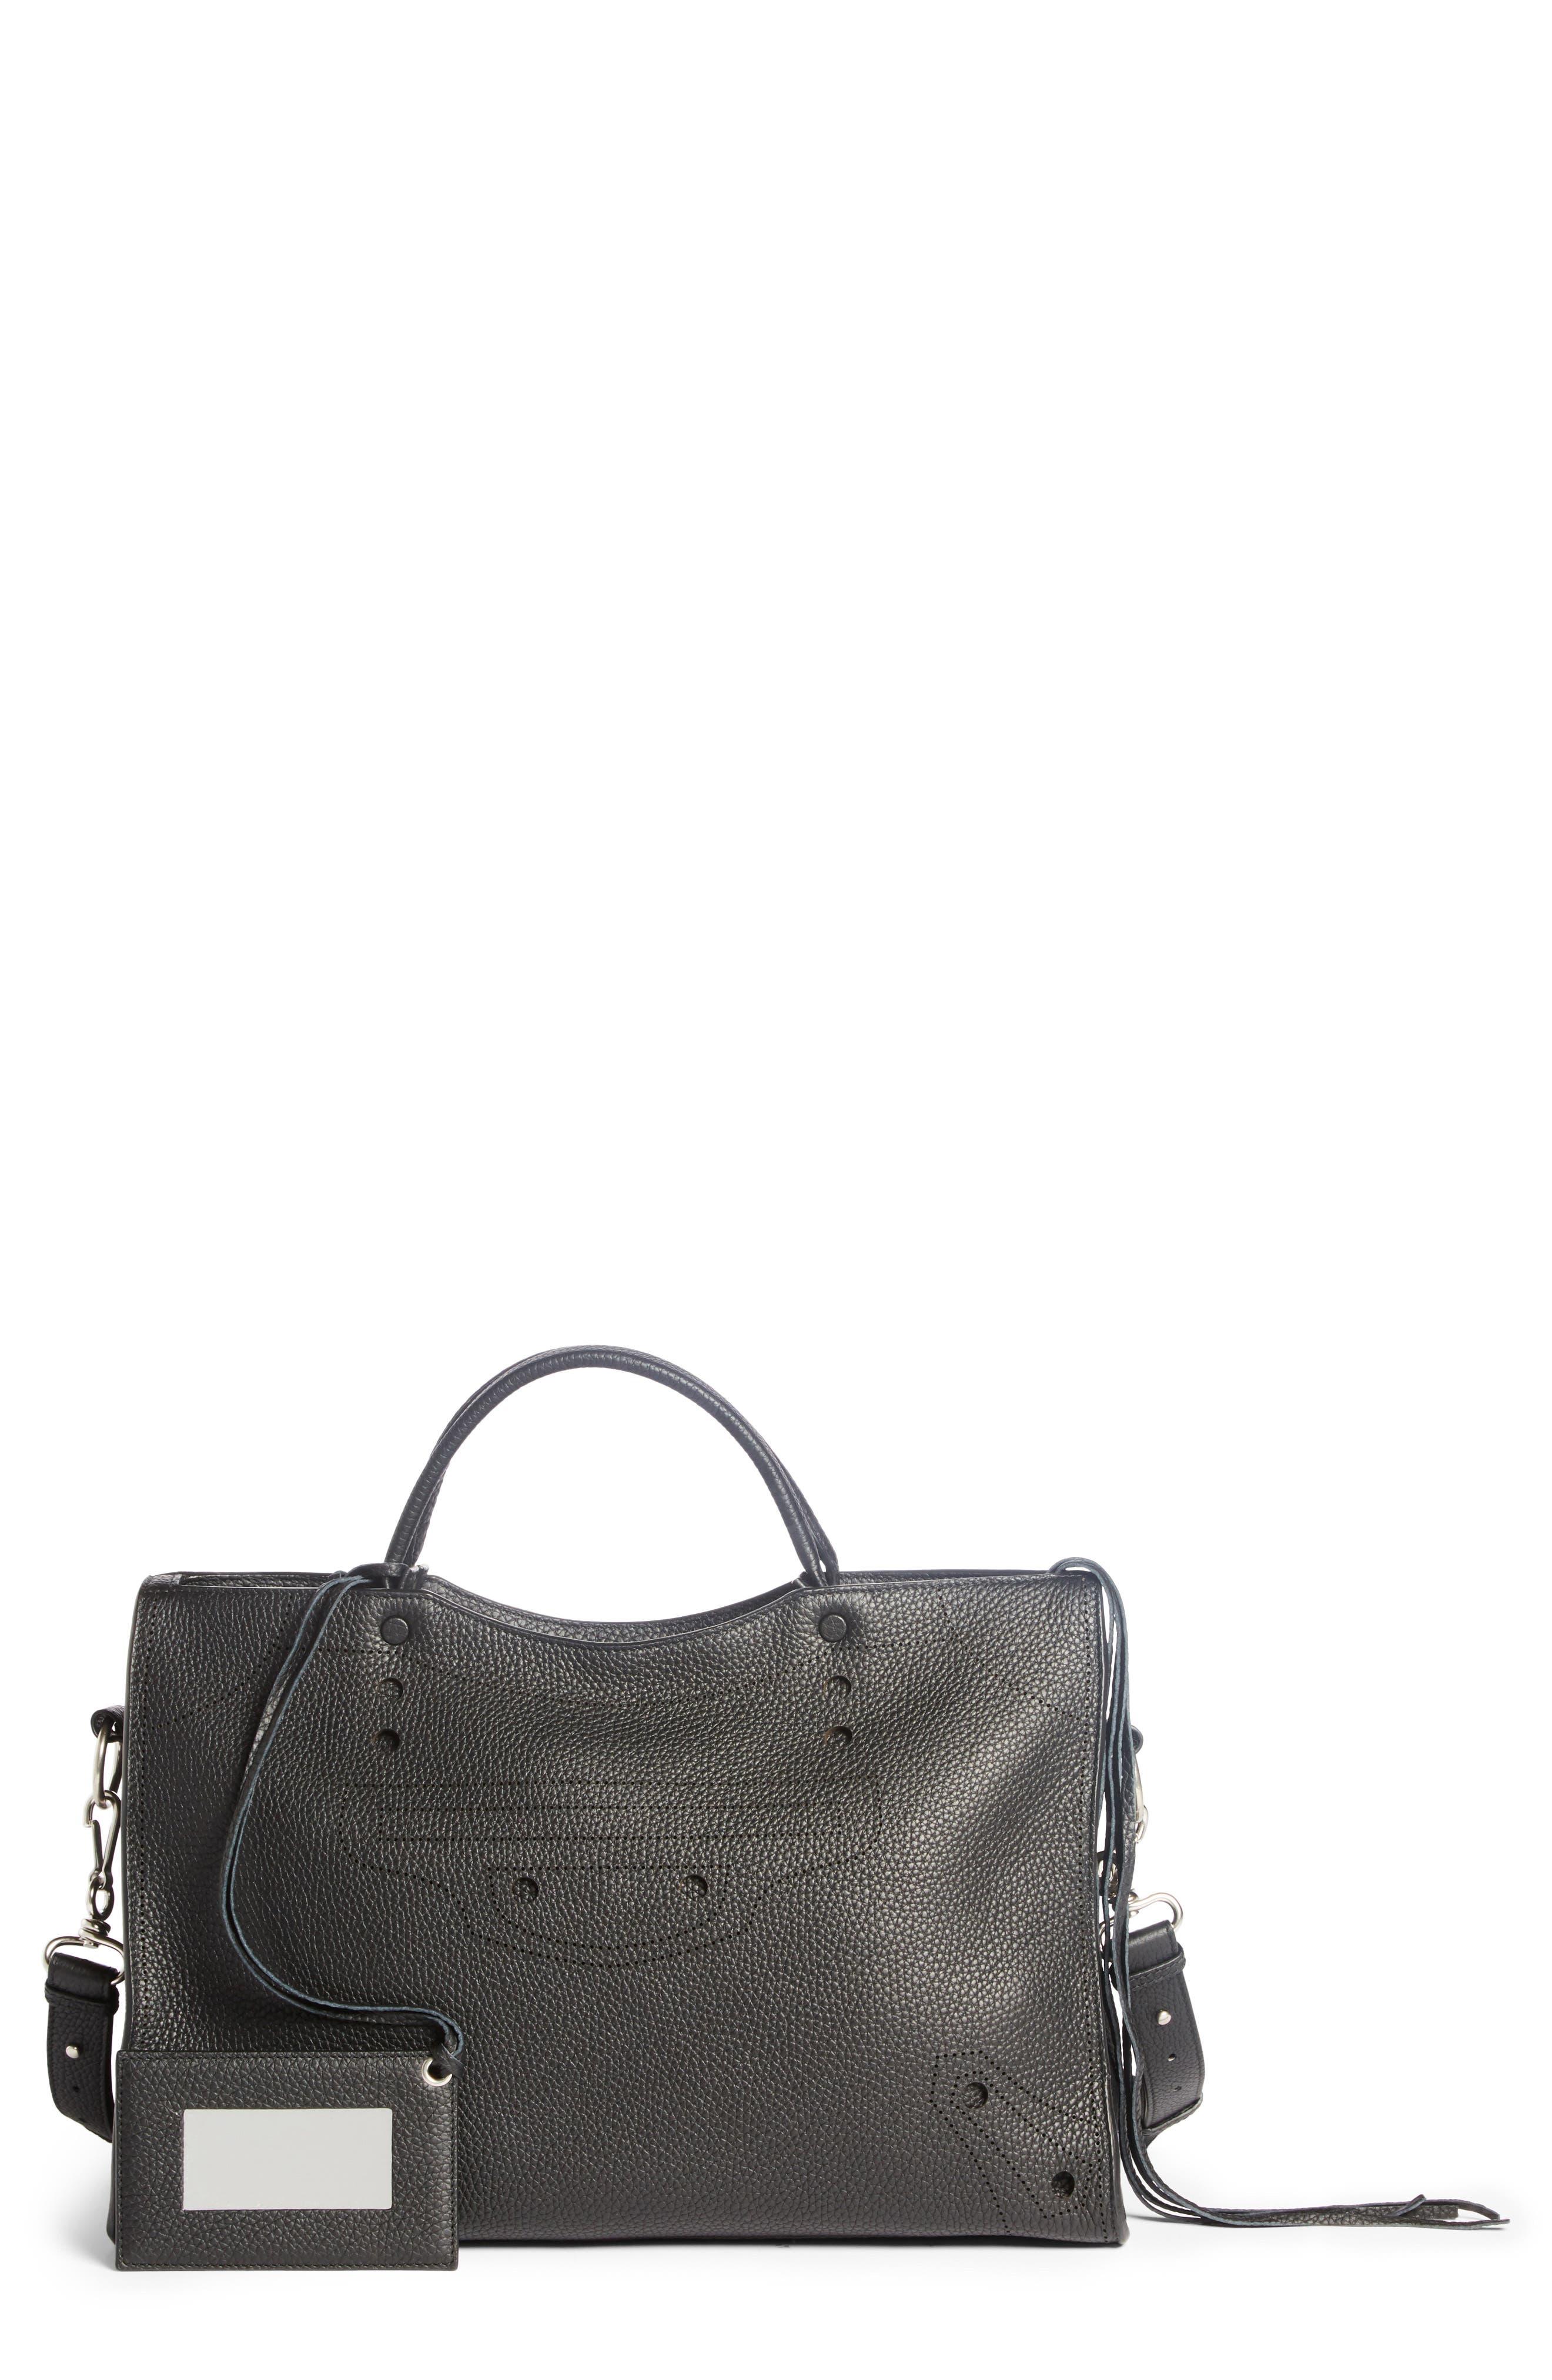 Main Image - Balenciaga Blackout City Leather Tote